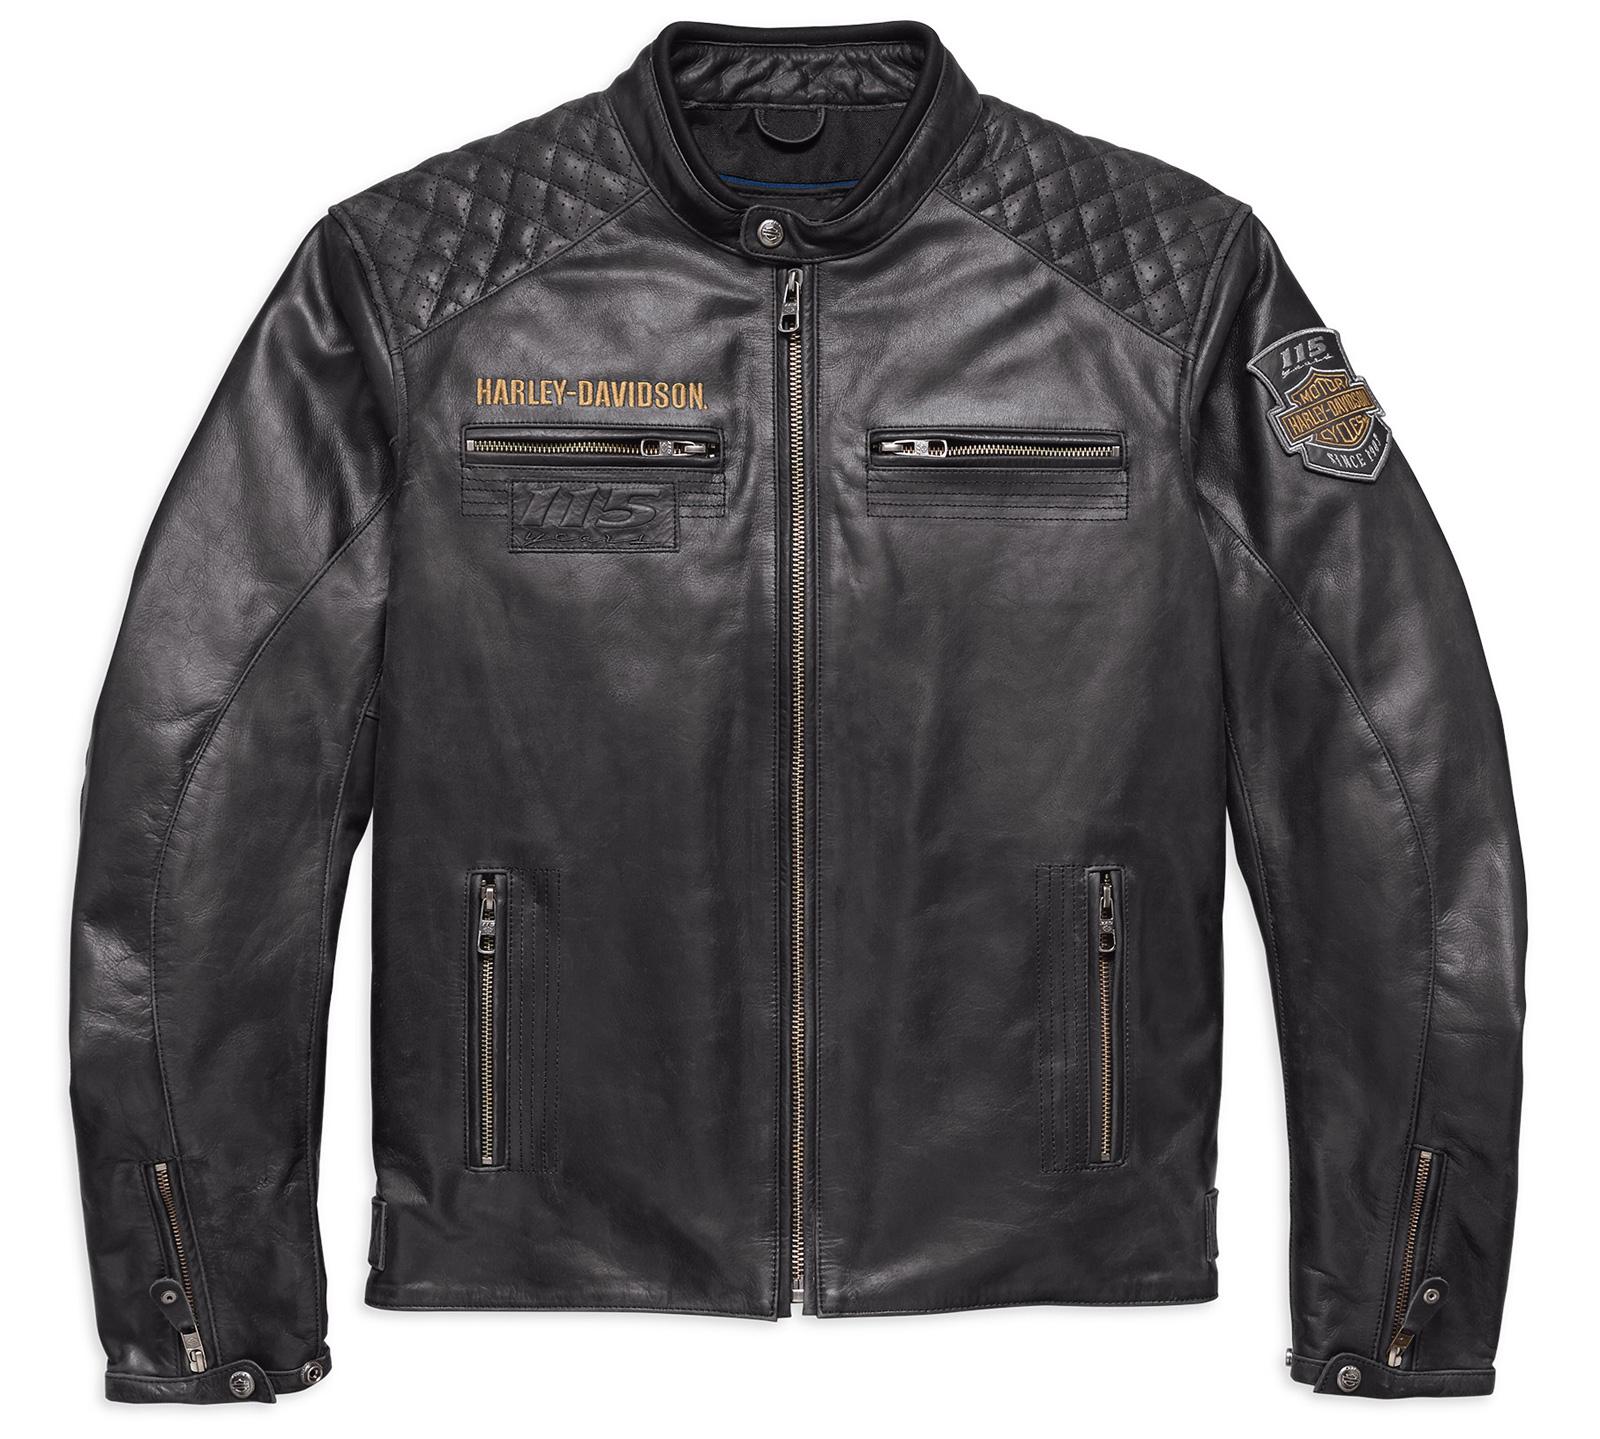 Harley Davidson Leather Jacket  Anniversary